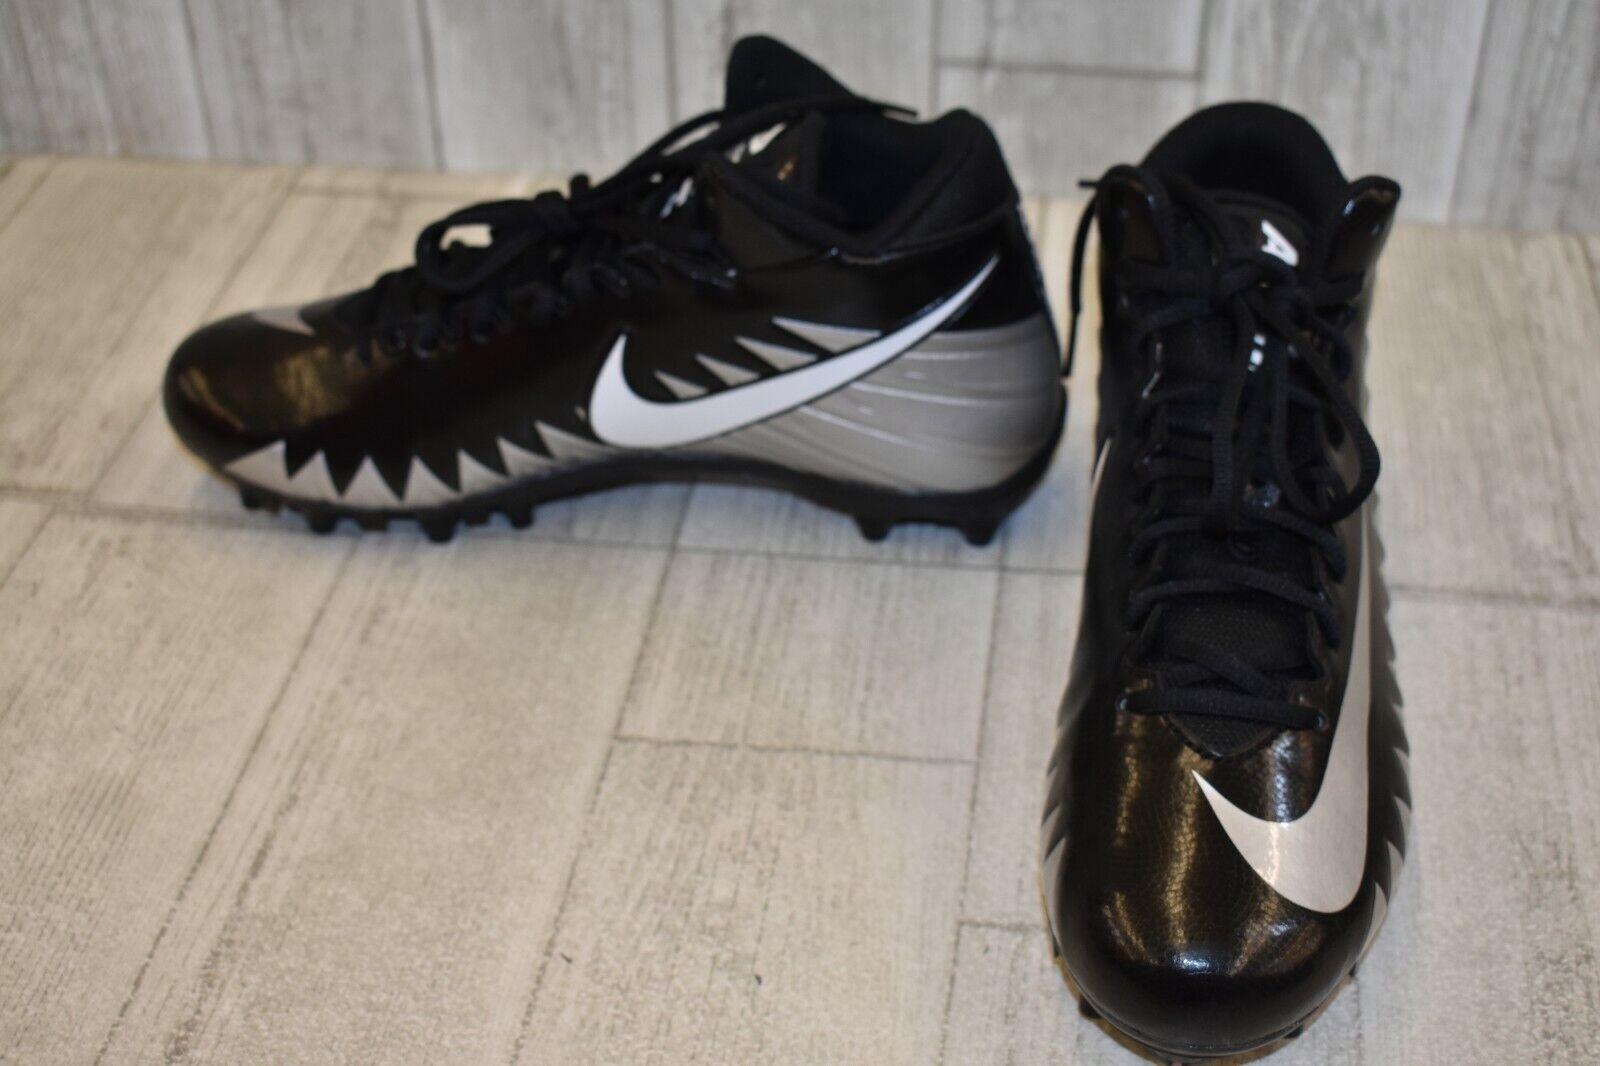 Nike Alpha Menace Varsity Mid Football Cleats, Men's Size 10.5, Black Silver